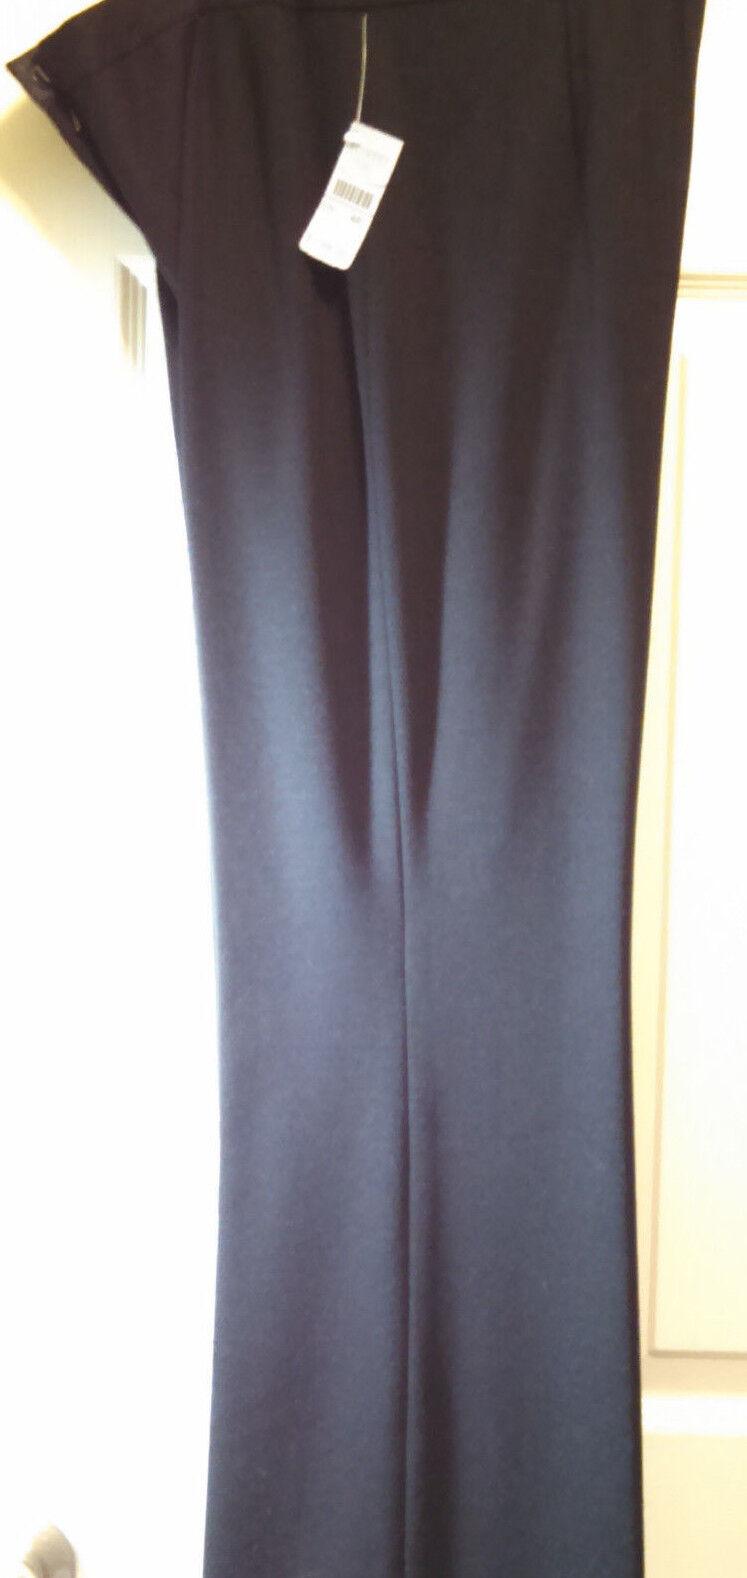 NEW  148 TALBOTS Collection Italian Fabric Pants Sz 4P 4 Petite Flare Classic